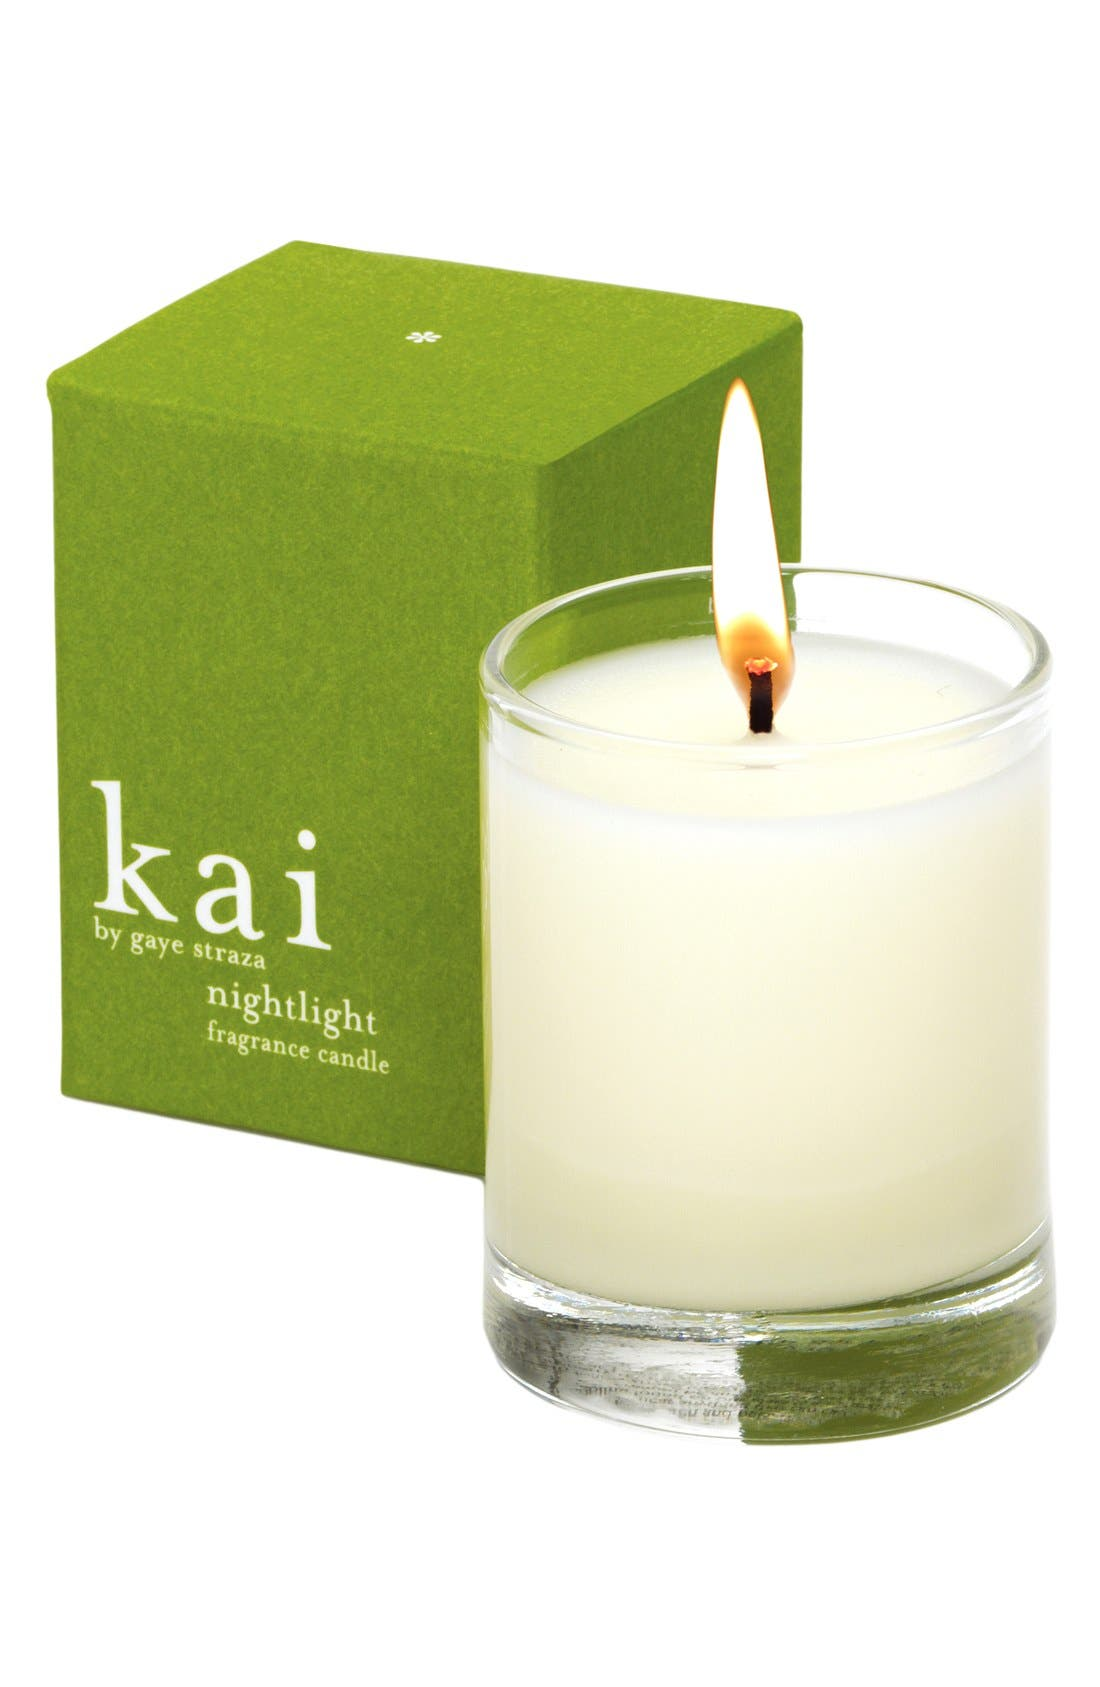 kai 'Nightlight' Fragrance Candle